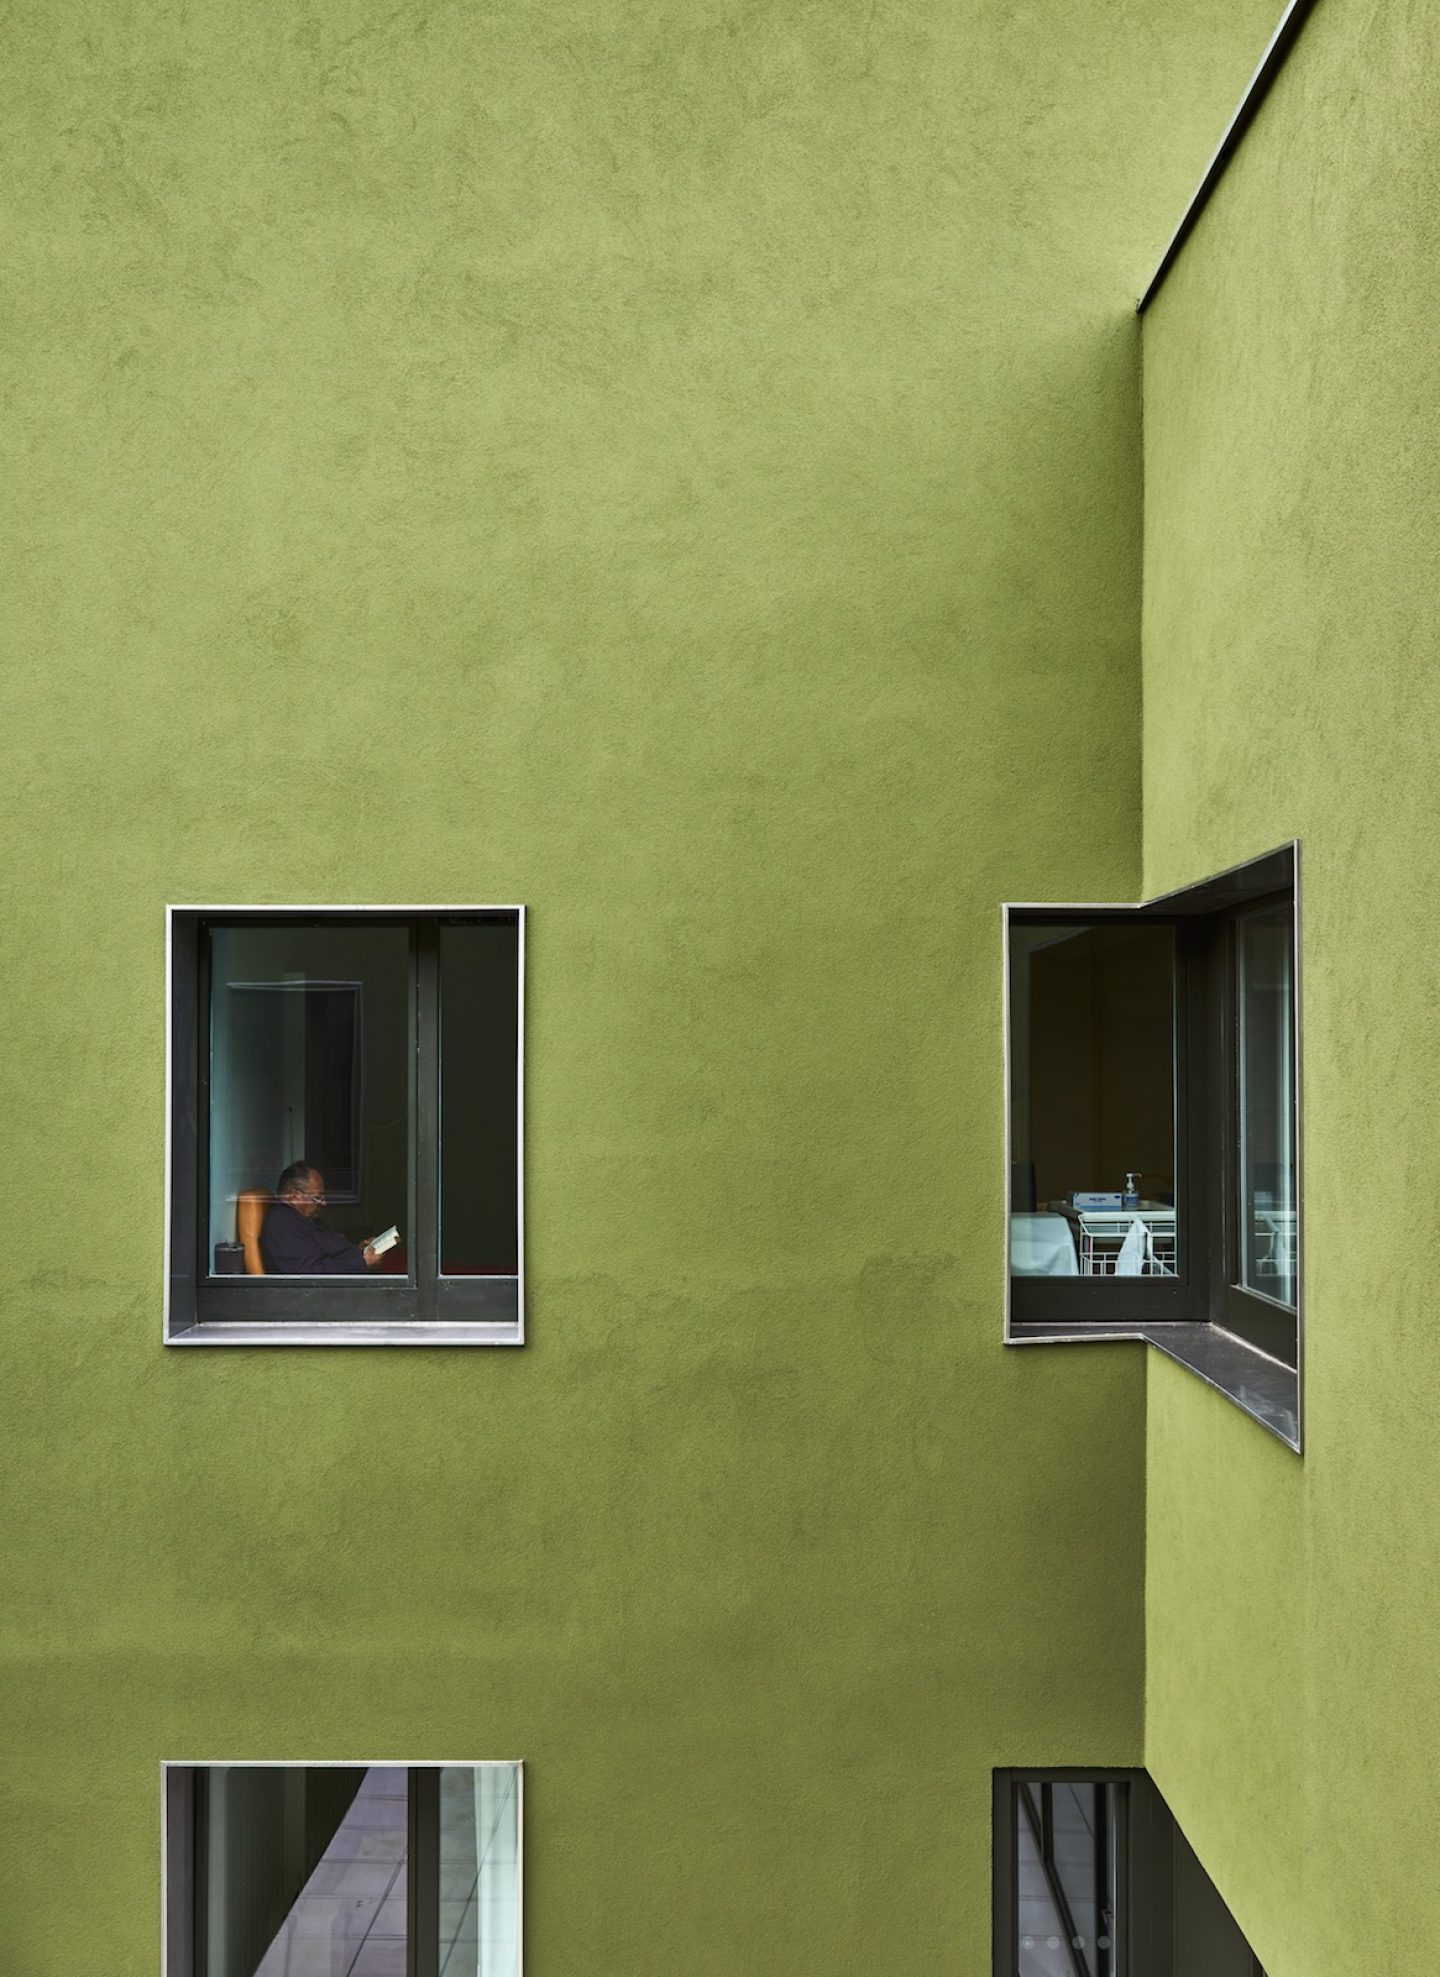 architecture_orbec_dominiquecoulon_associesarchitectes_12